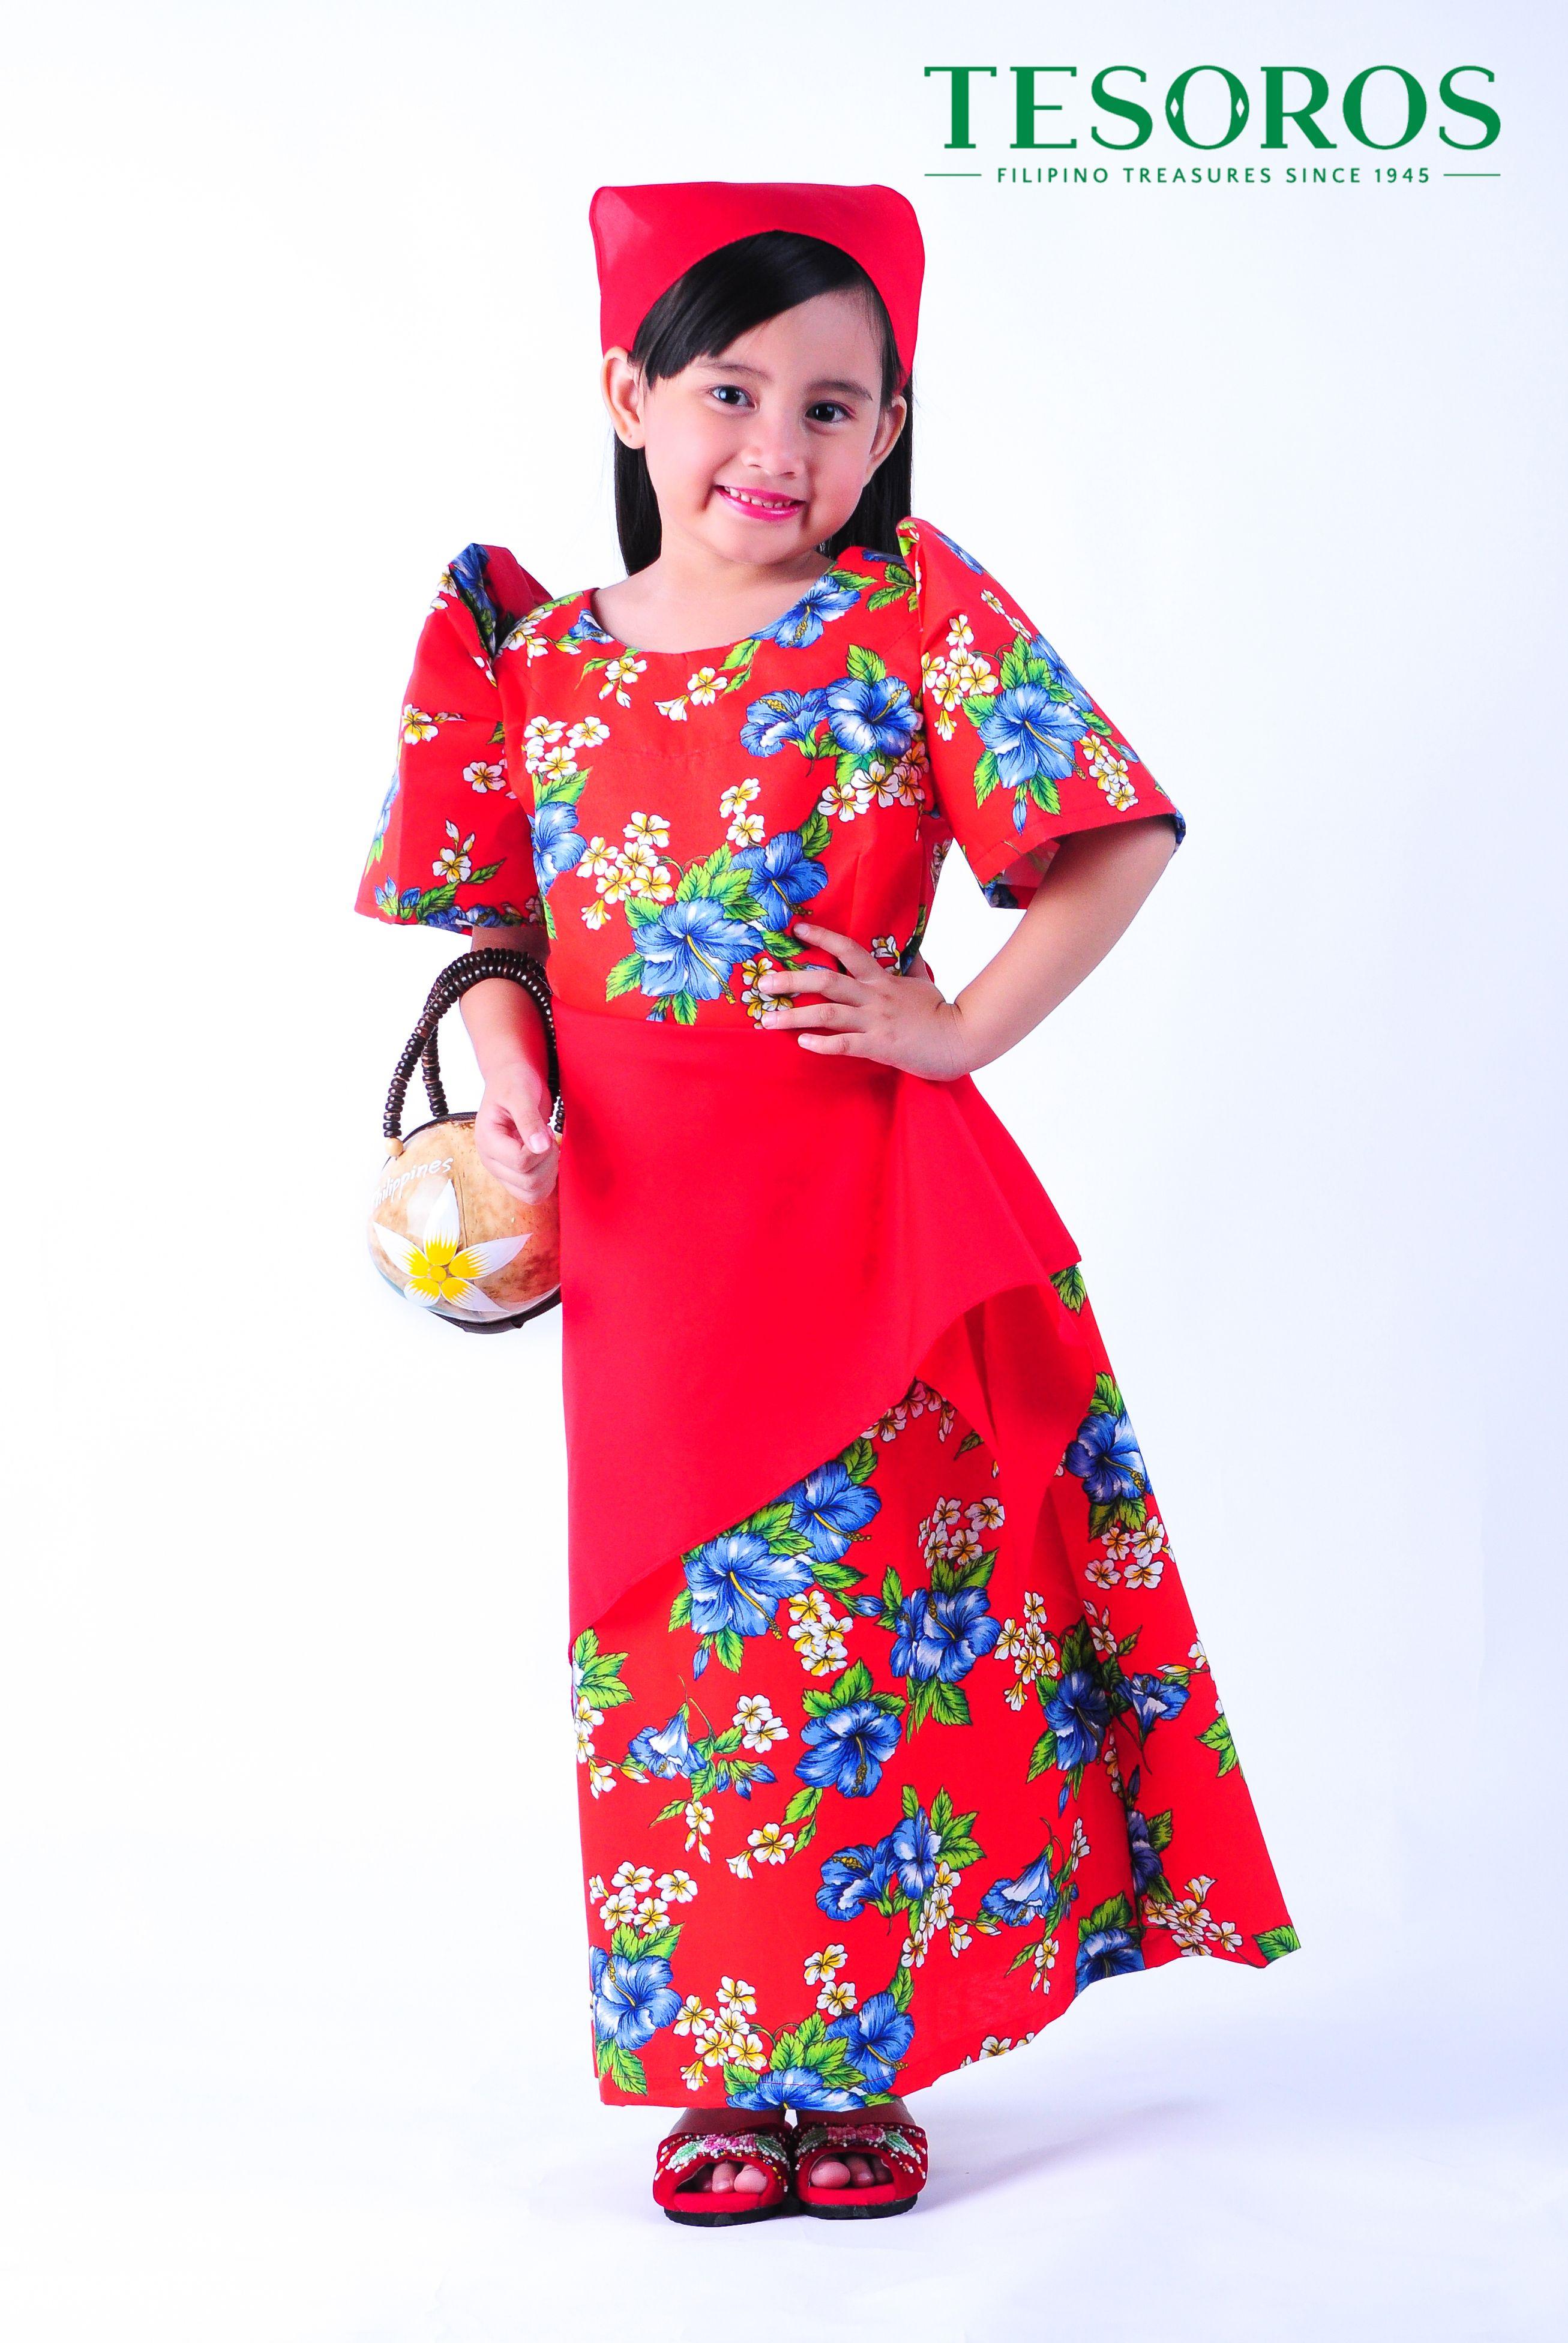 RED FLORAL BALINTAWAK DRESS A proudly young Filipina in Tesoro s Balintawak  with classic terno sleeves. 7cedaecdac